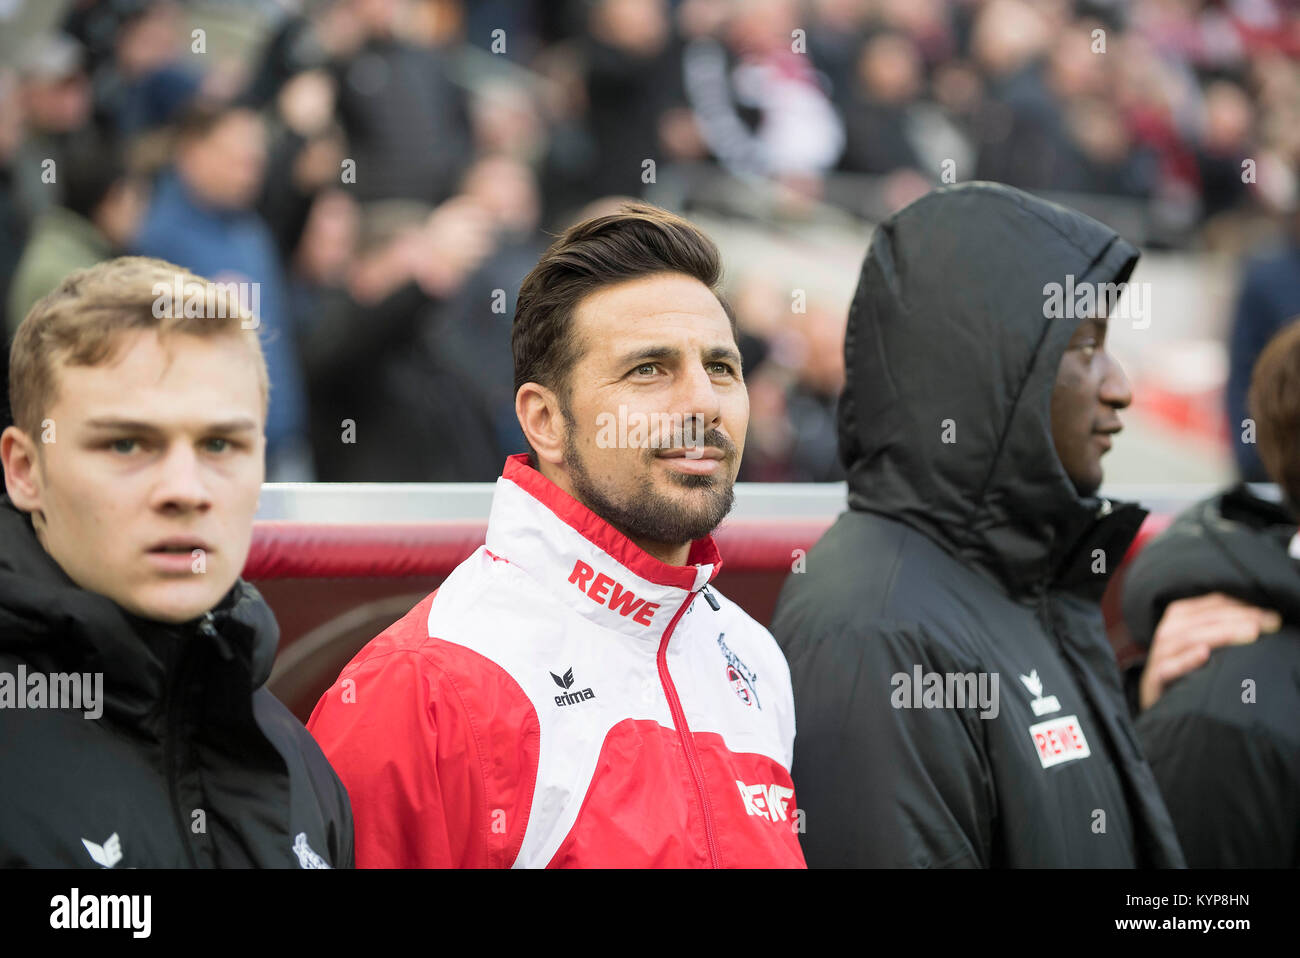 left to right Tim Henry HANDWERKER (K), Claudio PIZARRO (K) vor der Ersatzbank Fussball 1. Bundesliga, 18. matchday, - Stock Image